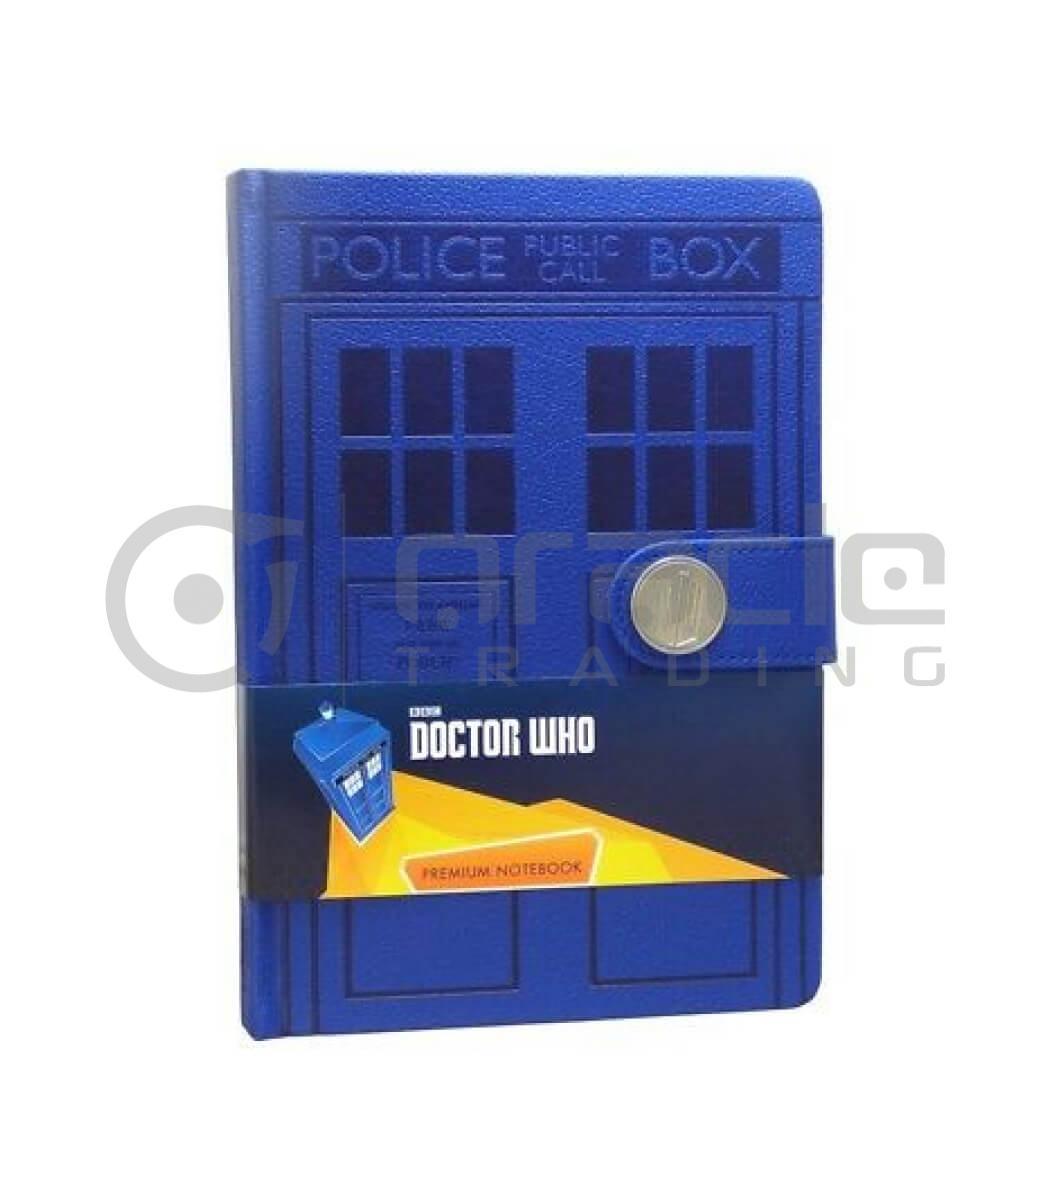 Doctor Who Notebook - Tardis (Premium)